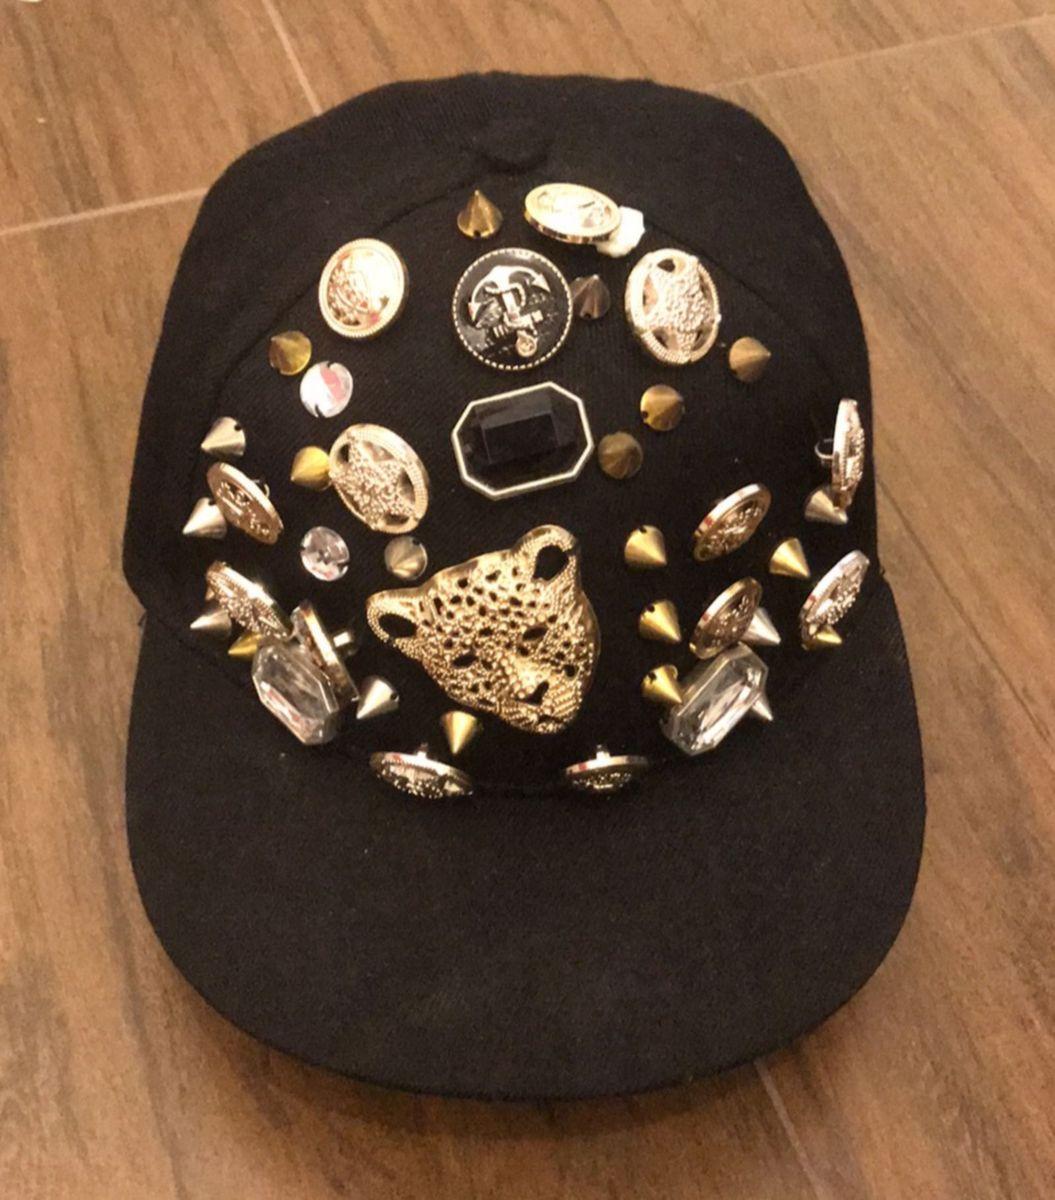 7c5e21941713b boné customizado tiger - chapeu sem marca.  Czm6ly9wag90b3muzw5qb2vplmnvbs5ici9wcm9kdwn0cy81mzu3odm5l2y4zgy3zdkyzjdmndvkm2vlyty2mgflztm0odrlmti2lmpwzw  ...